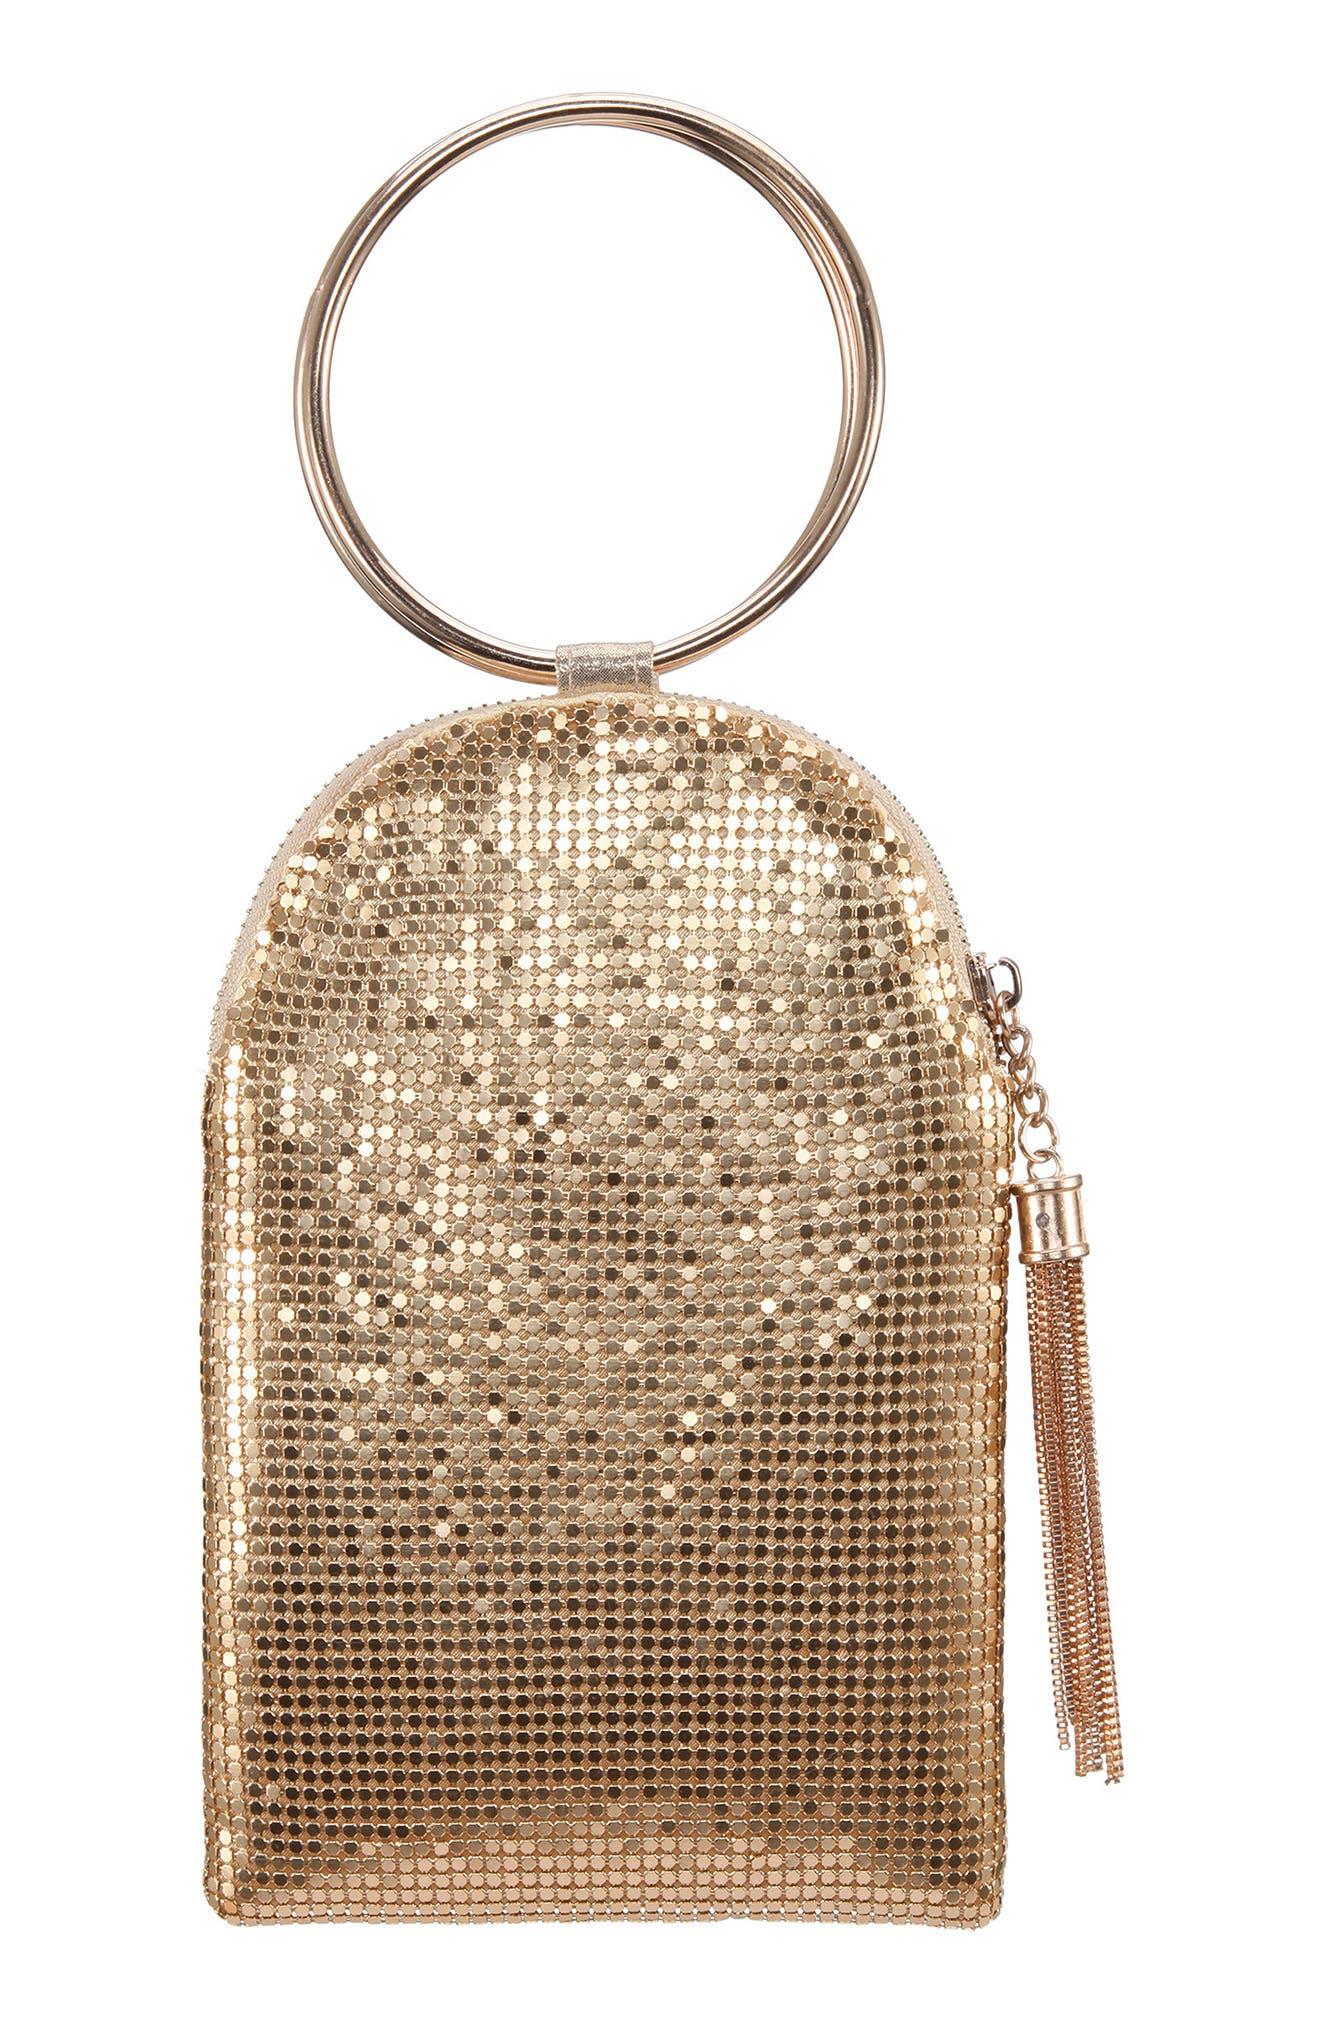 1920s Accessories: Feather Boas, Cigarette Holders, Flasks Nina Metallic Mesh Handbag - Metallic $43.50 AT vintagedancer.com